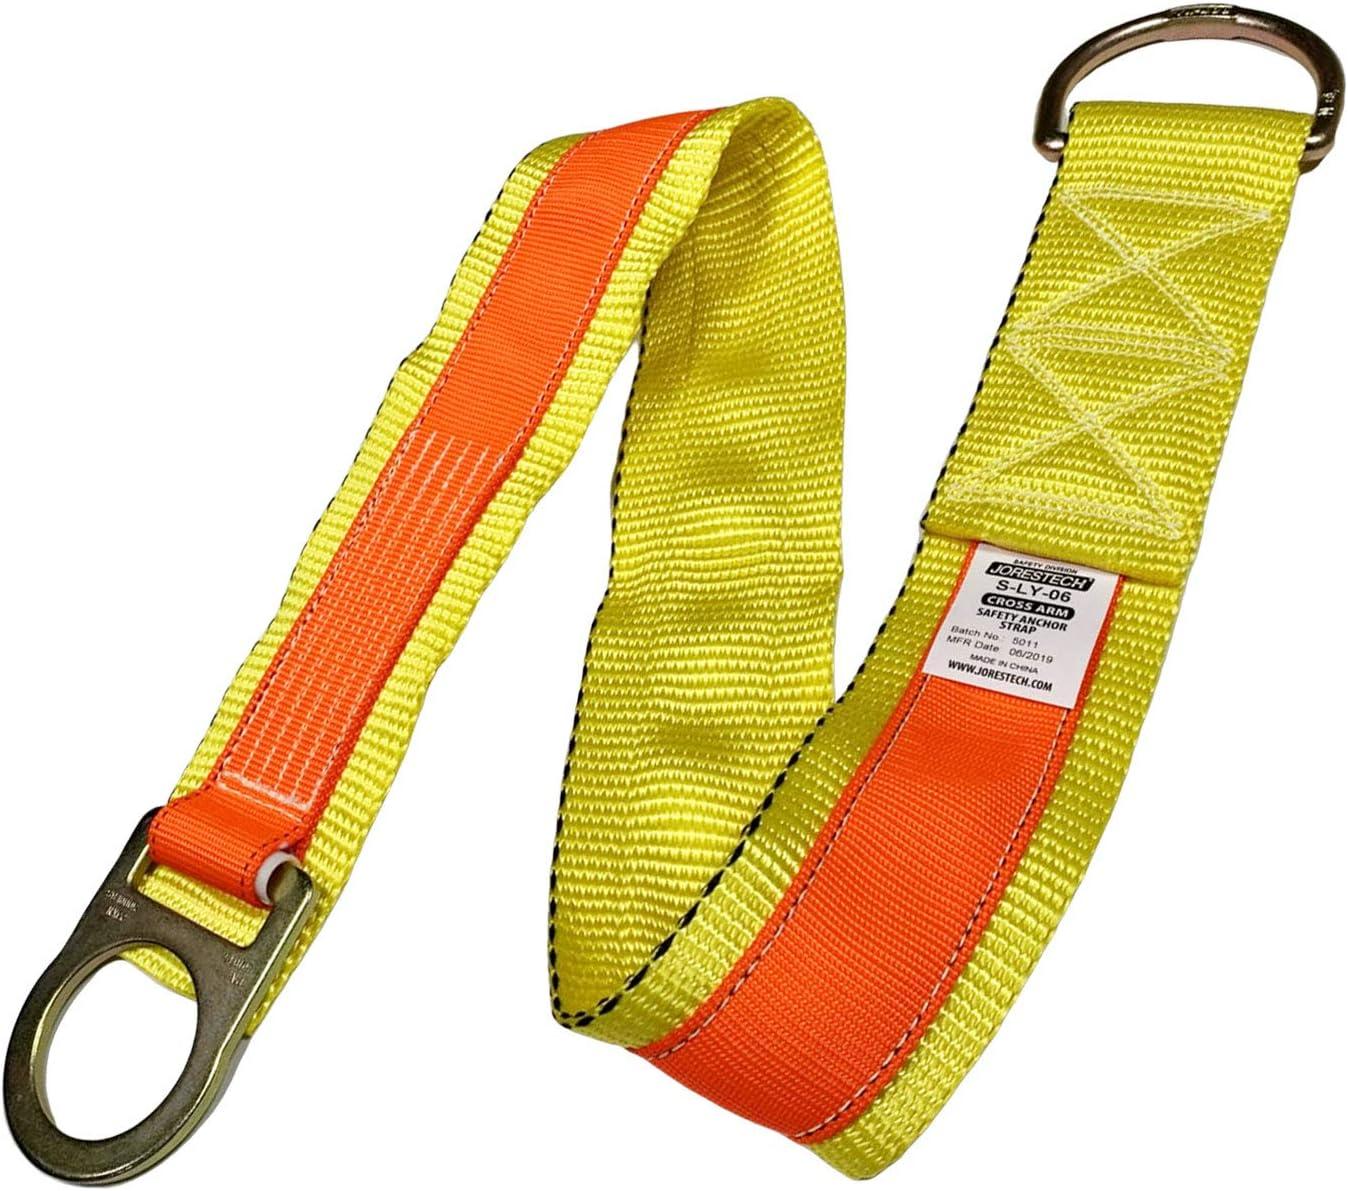 JORESTECH 4-Foot Safety Lanyard Fall Protection Equipment (Cross